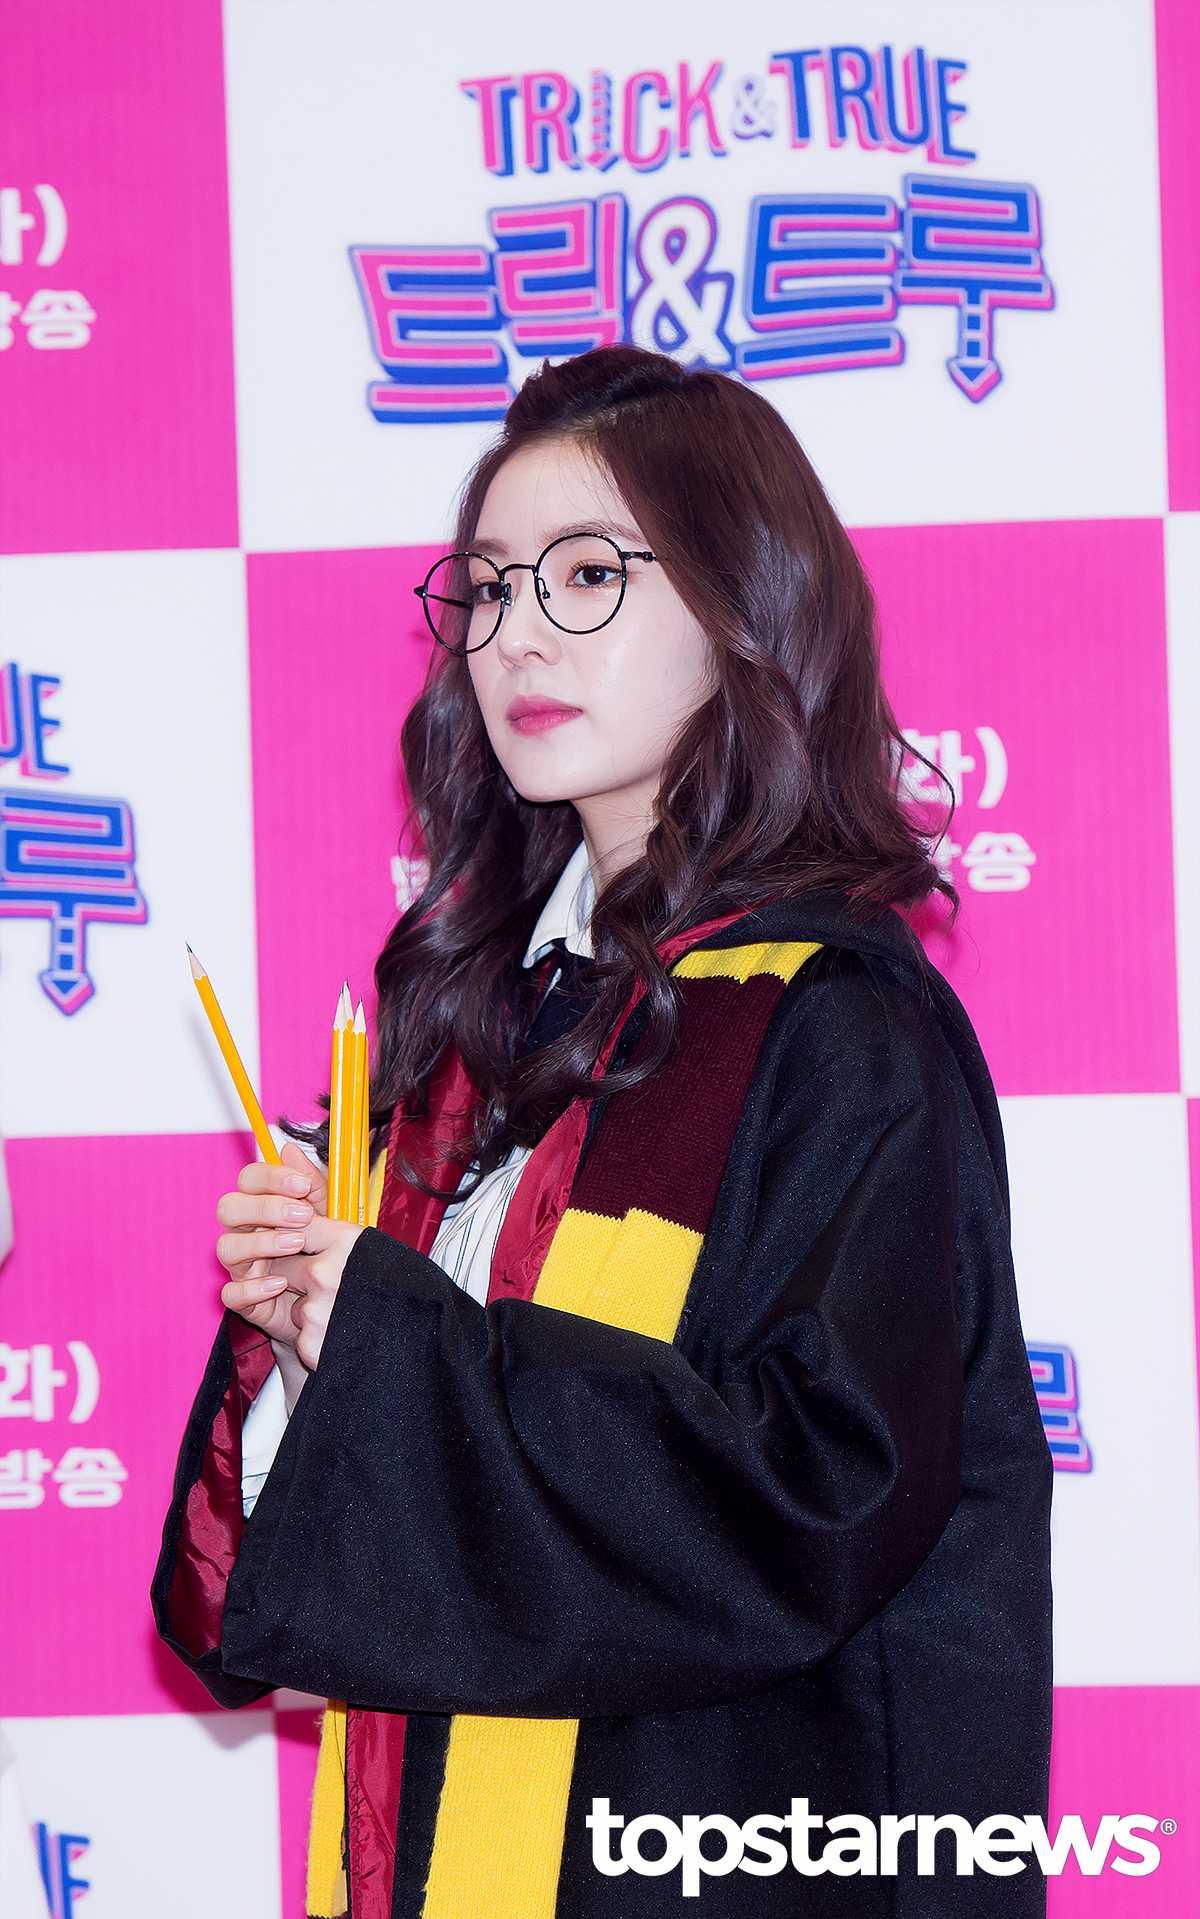 Irene 的穿著和妝容都成為女生關注的焦點,人氣完全爆棚!!!